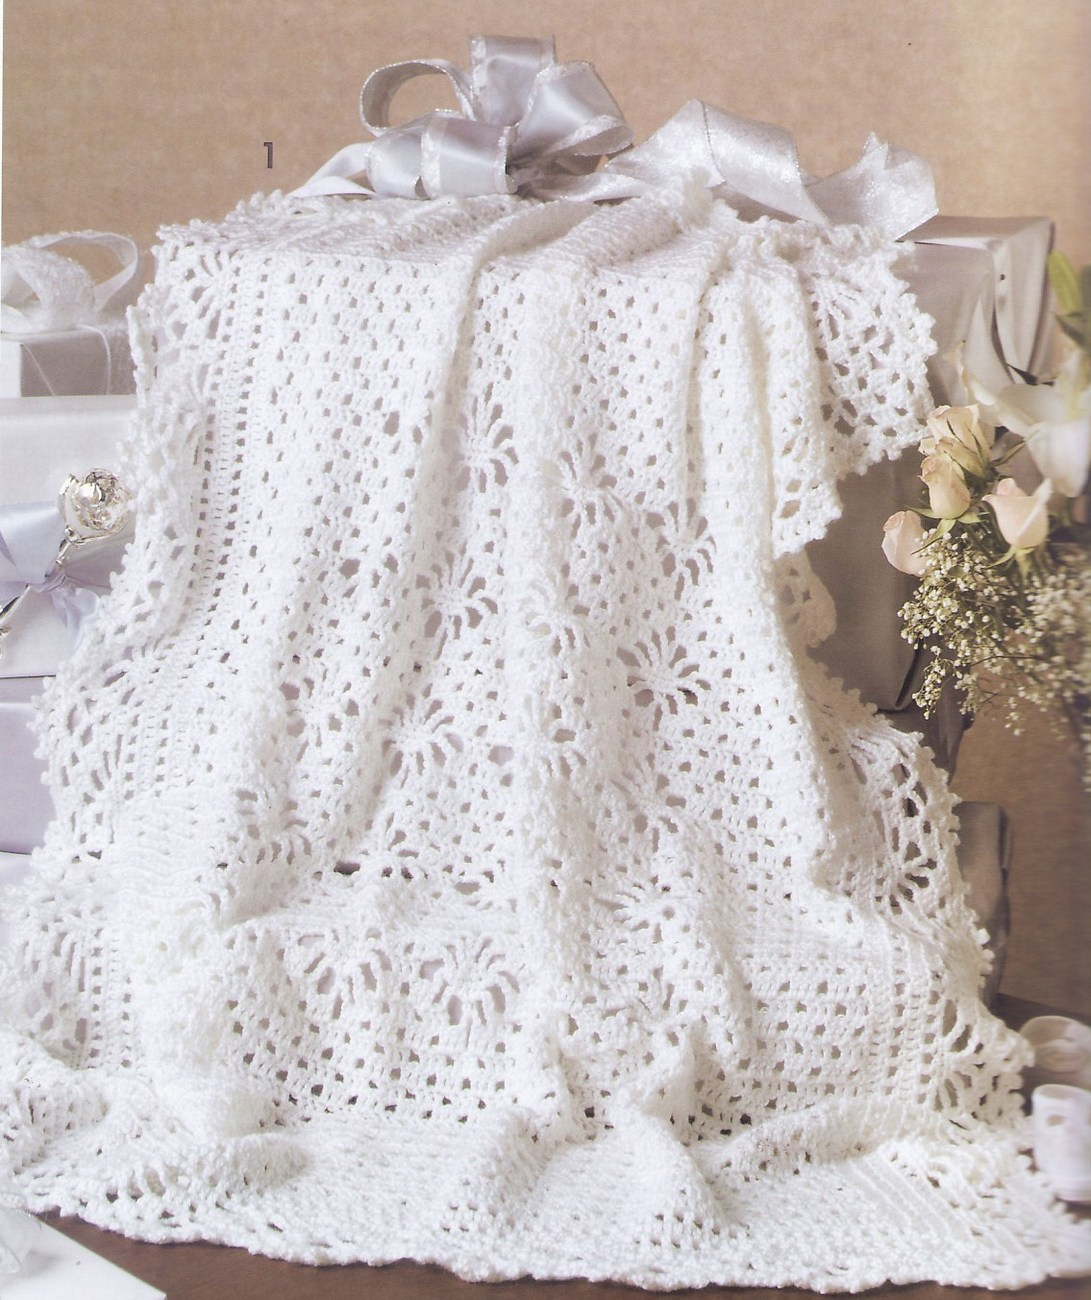 Crochet Pattern For Christening Blanket : Keepsake Baby Afghans Crochet Patterns Book 7 Designs ...